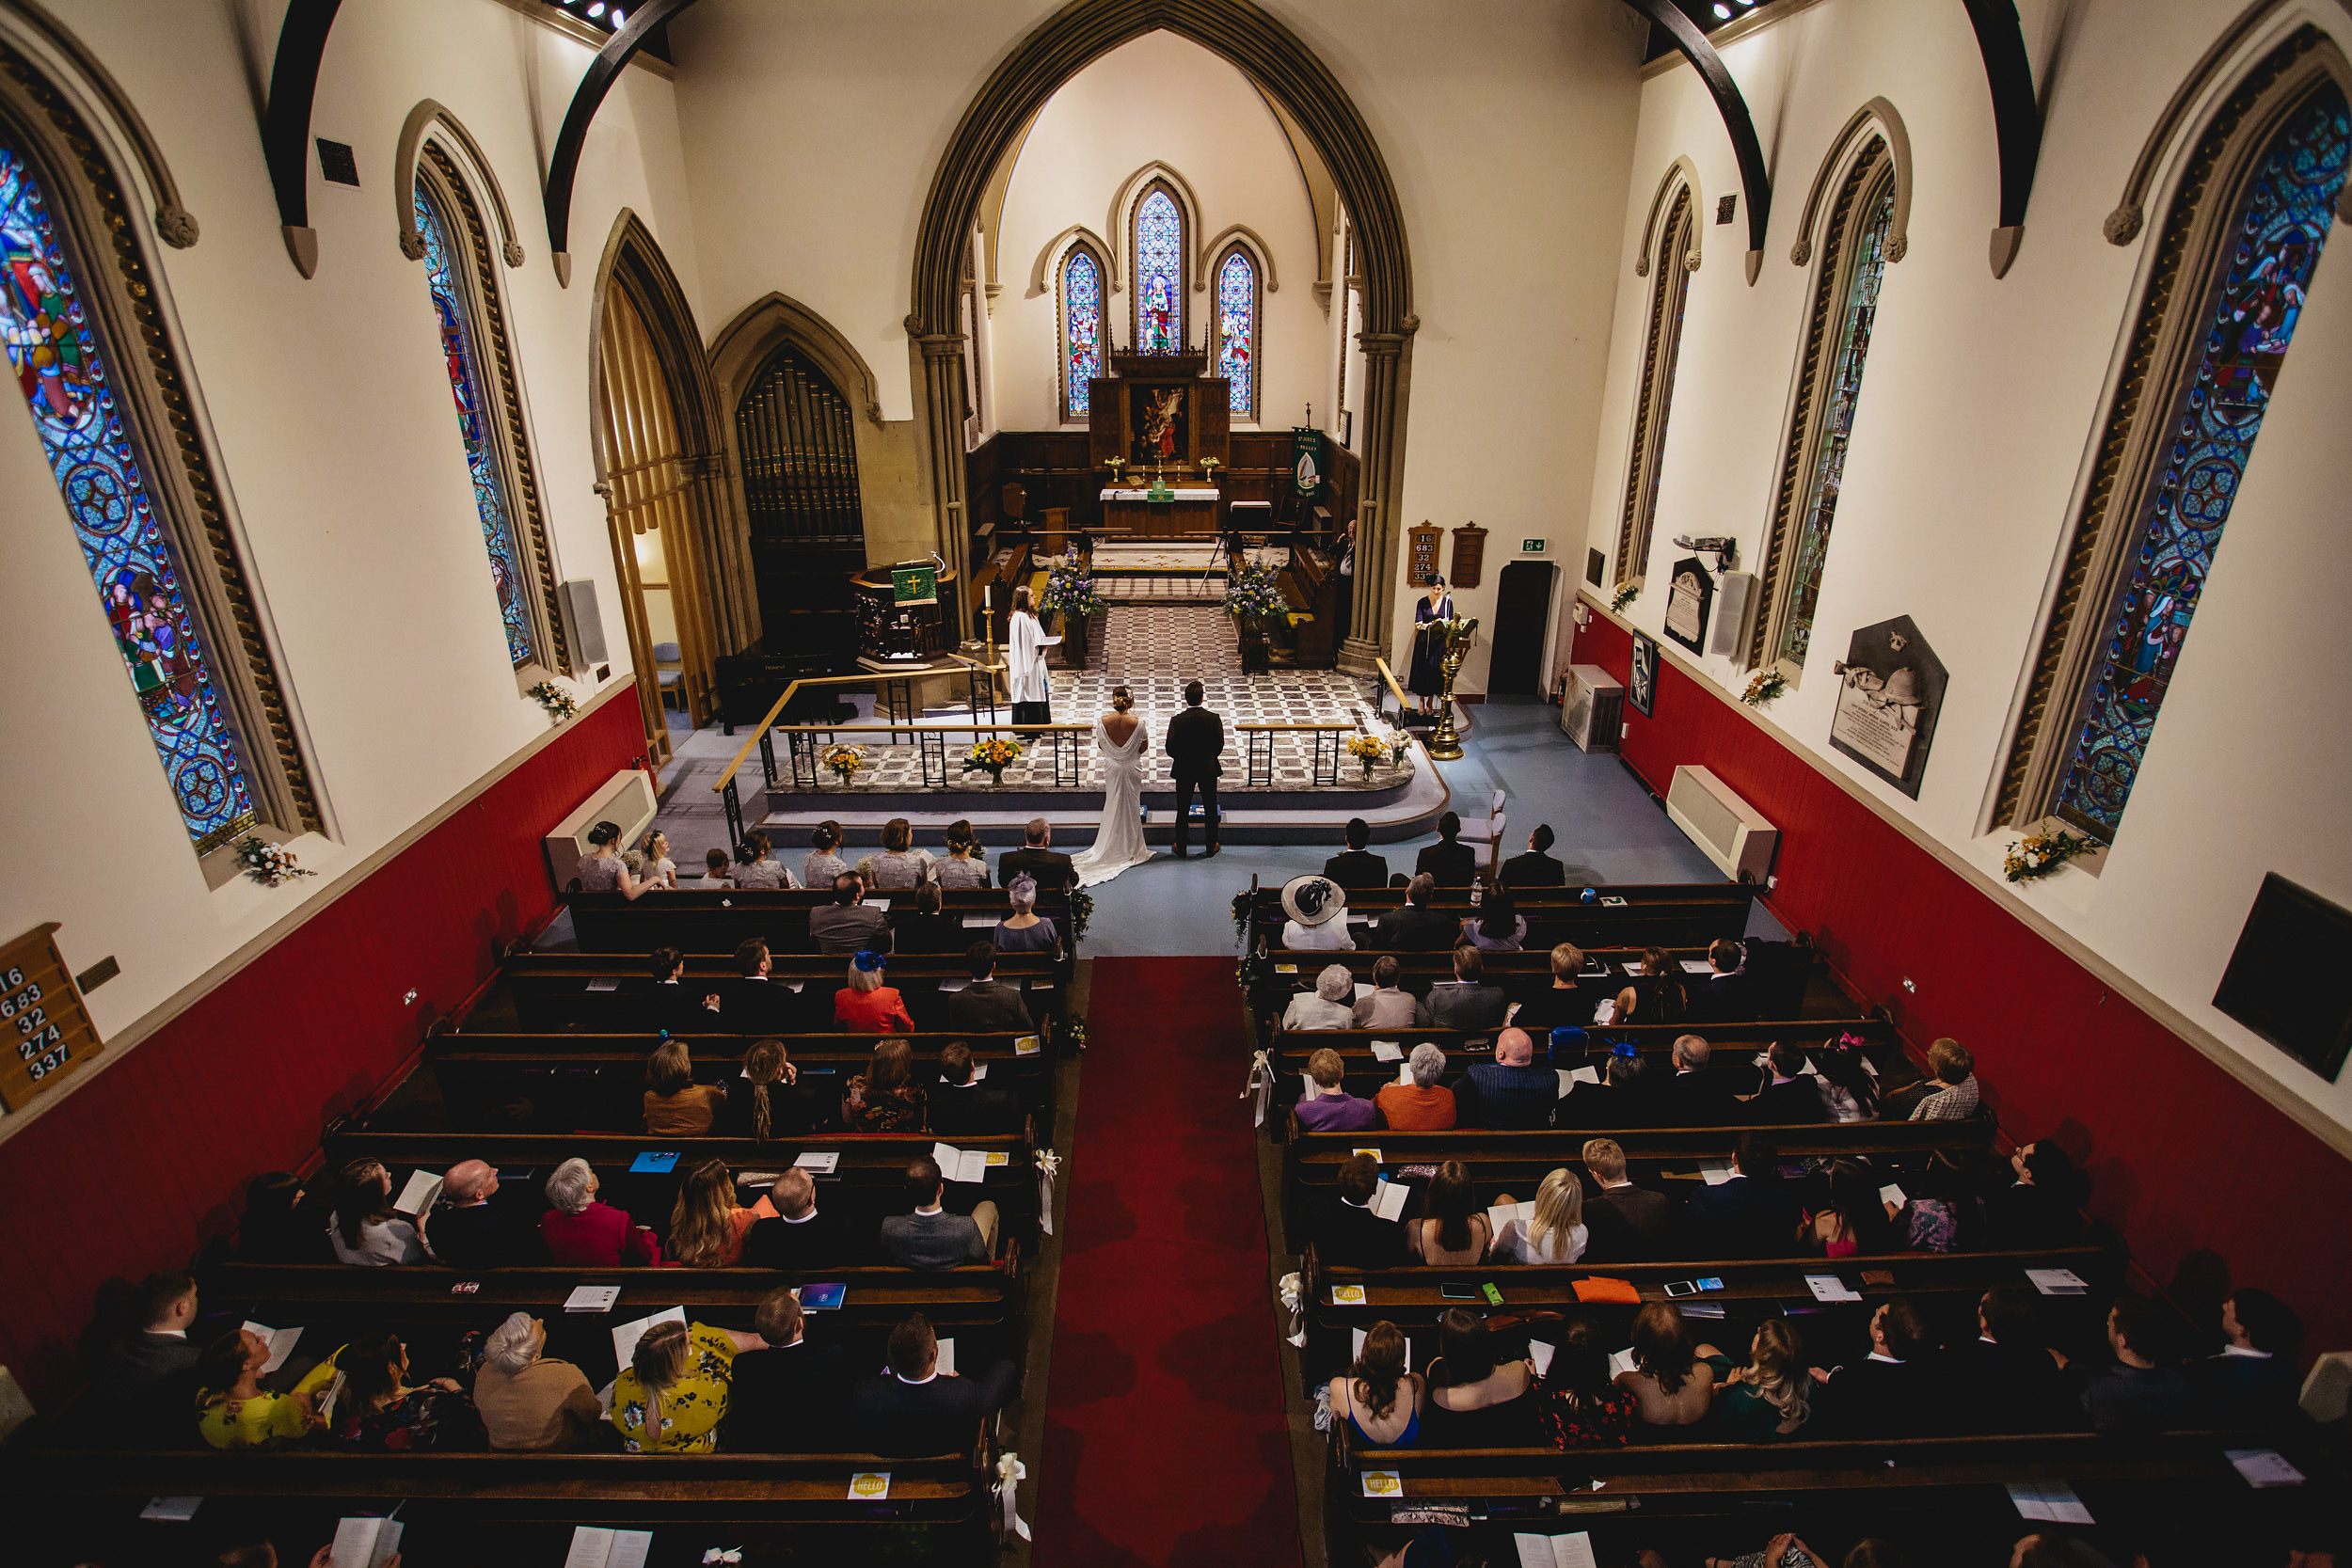 Church ceremony at a wedding